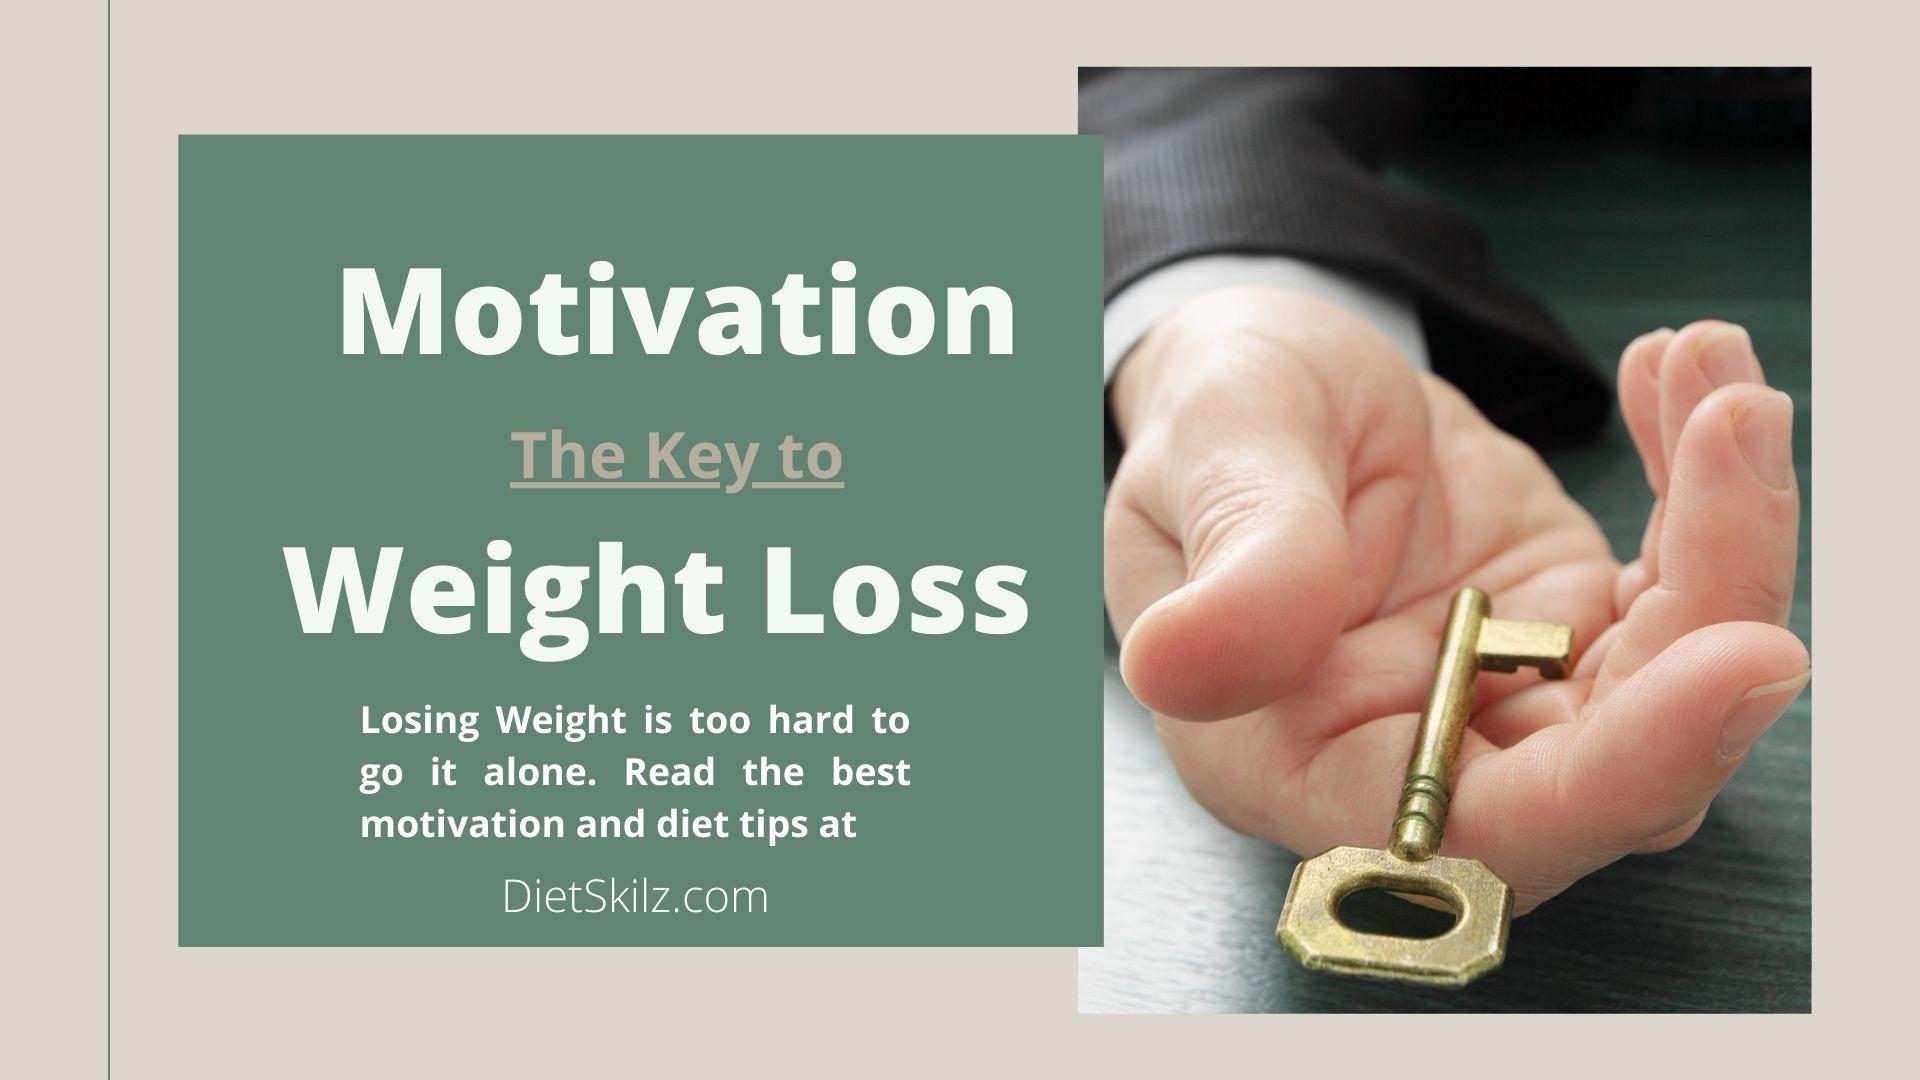 Dietskilz For Weight Loss Motivation Social Image